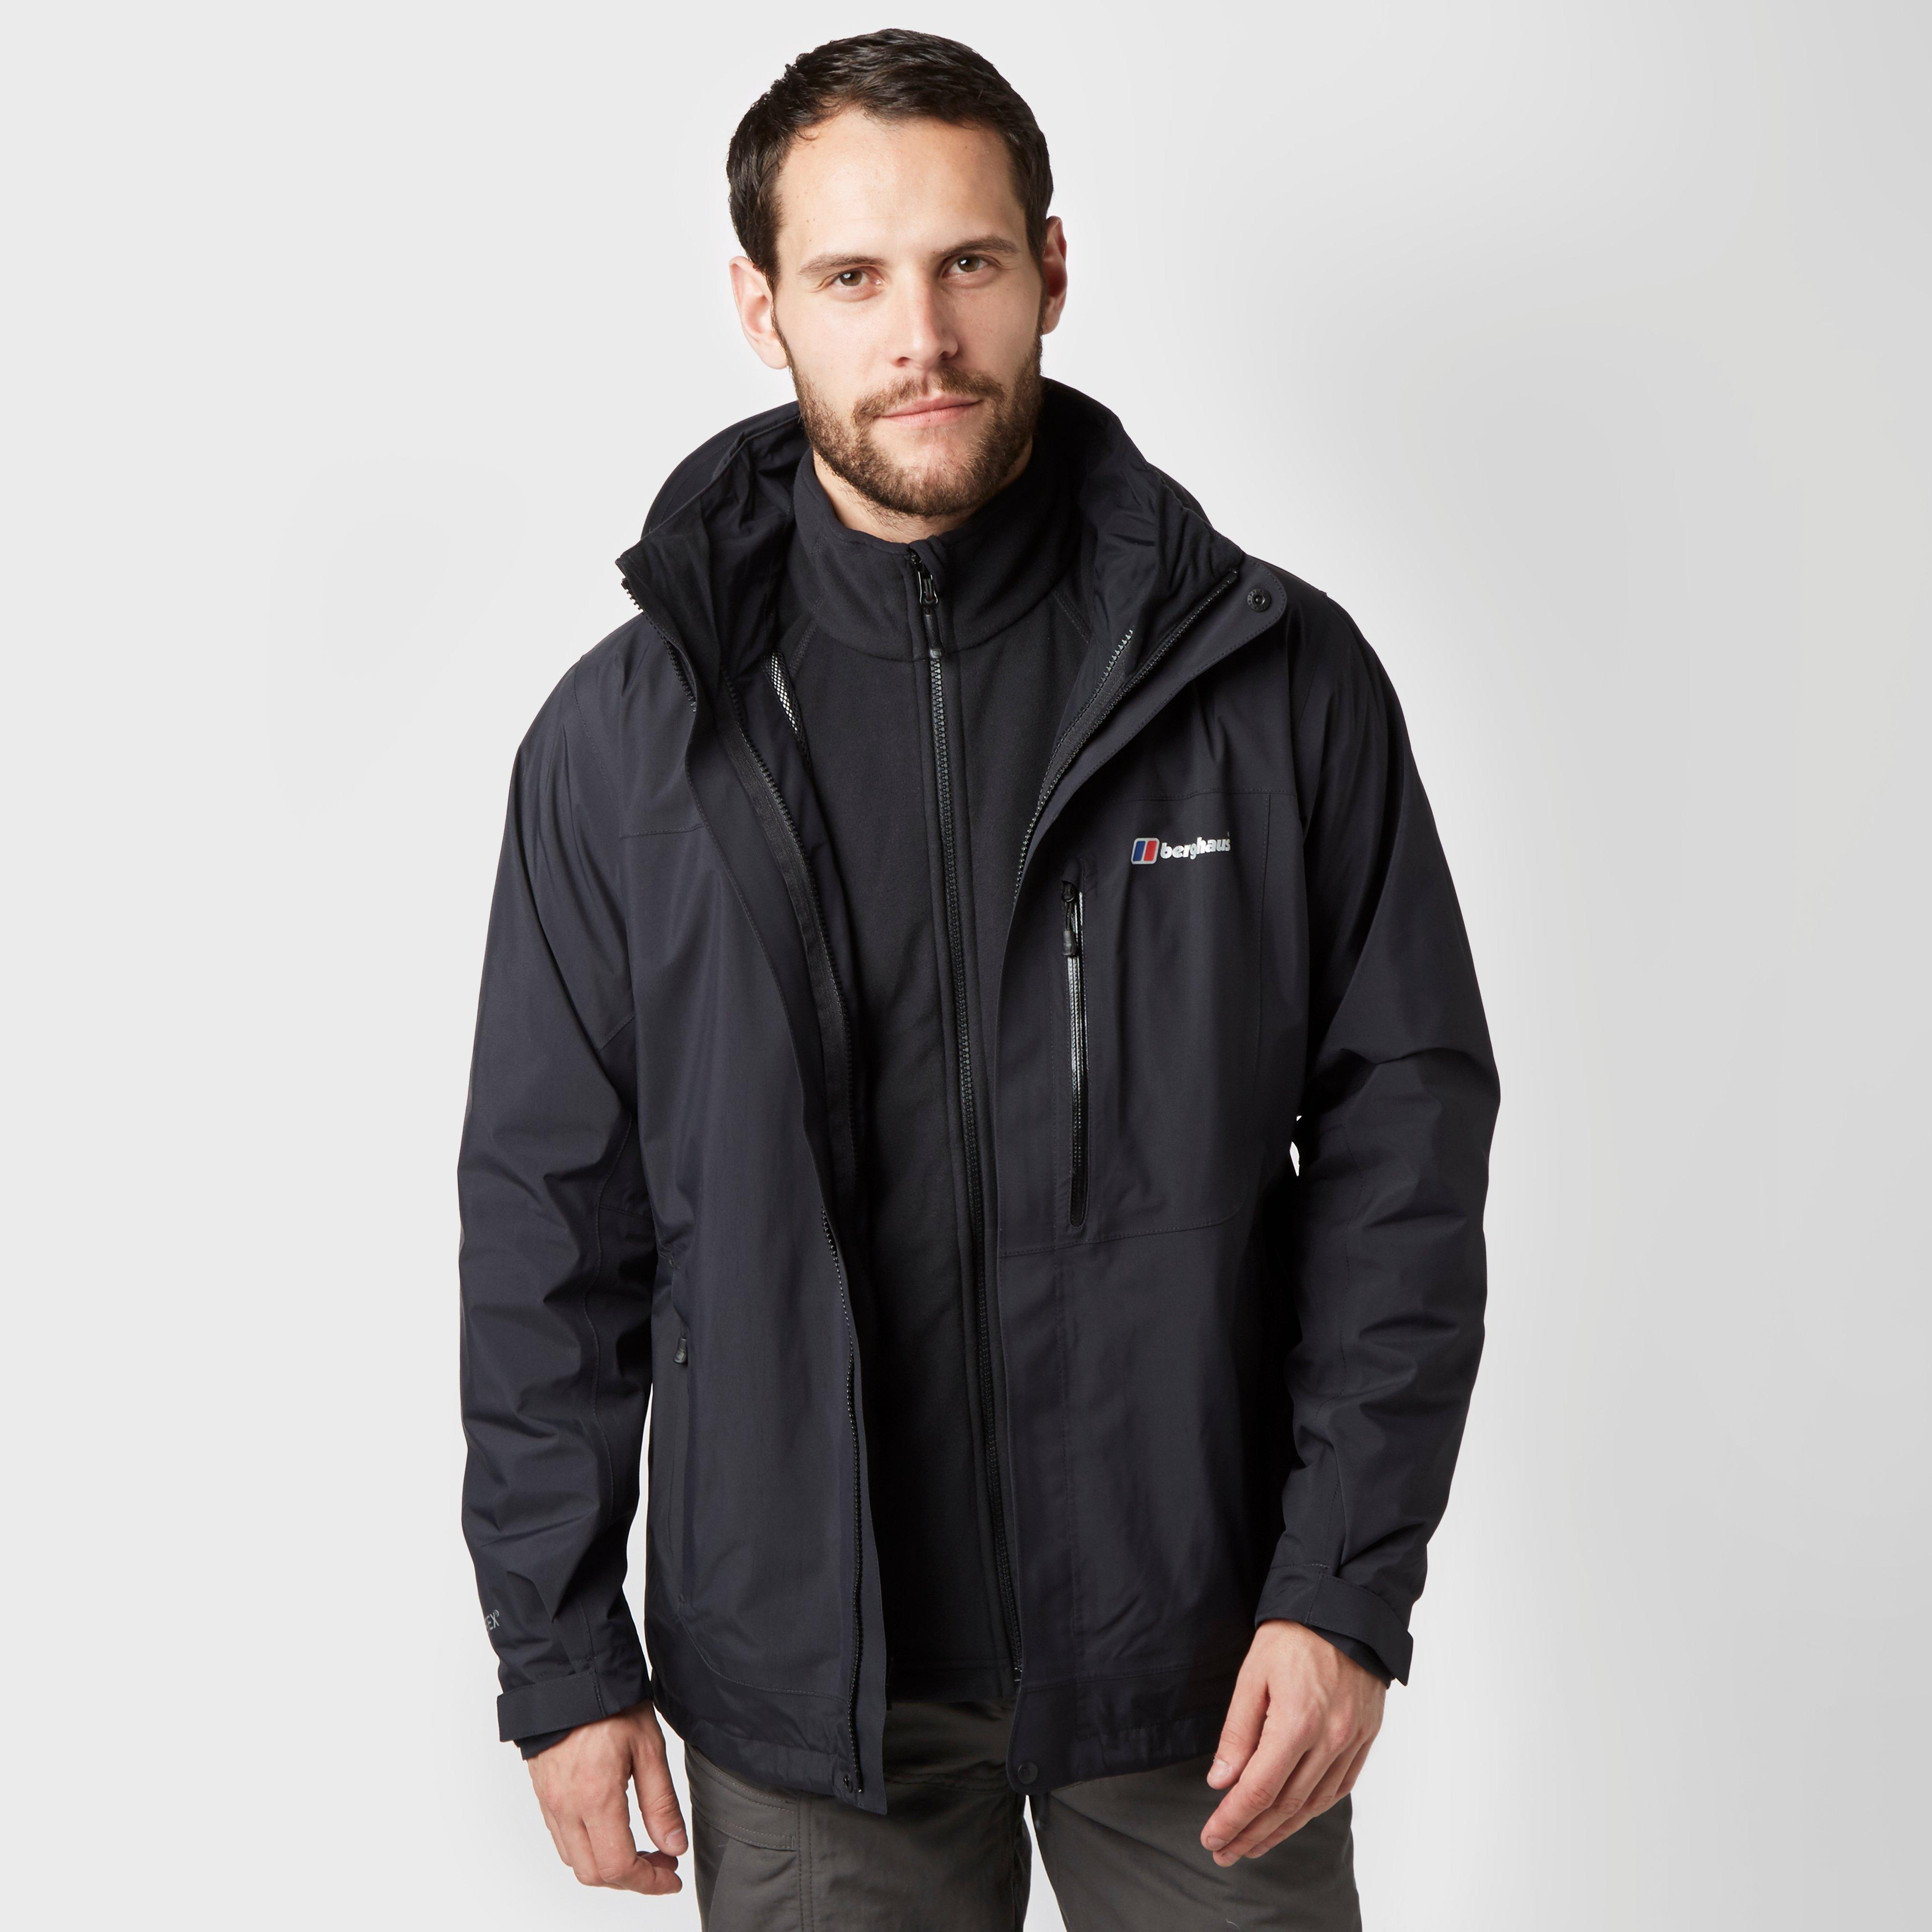 Berghaus Men S Arisdale Gtx 3 In 1 Jacket